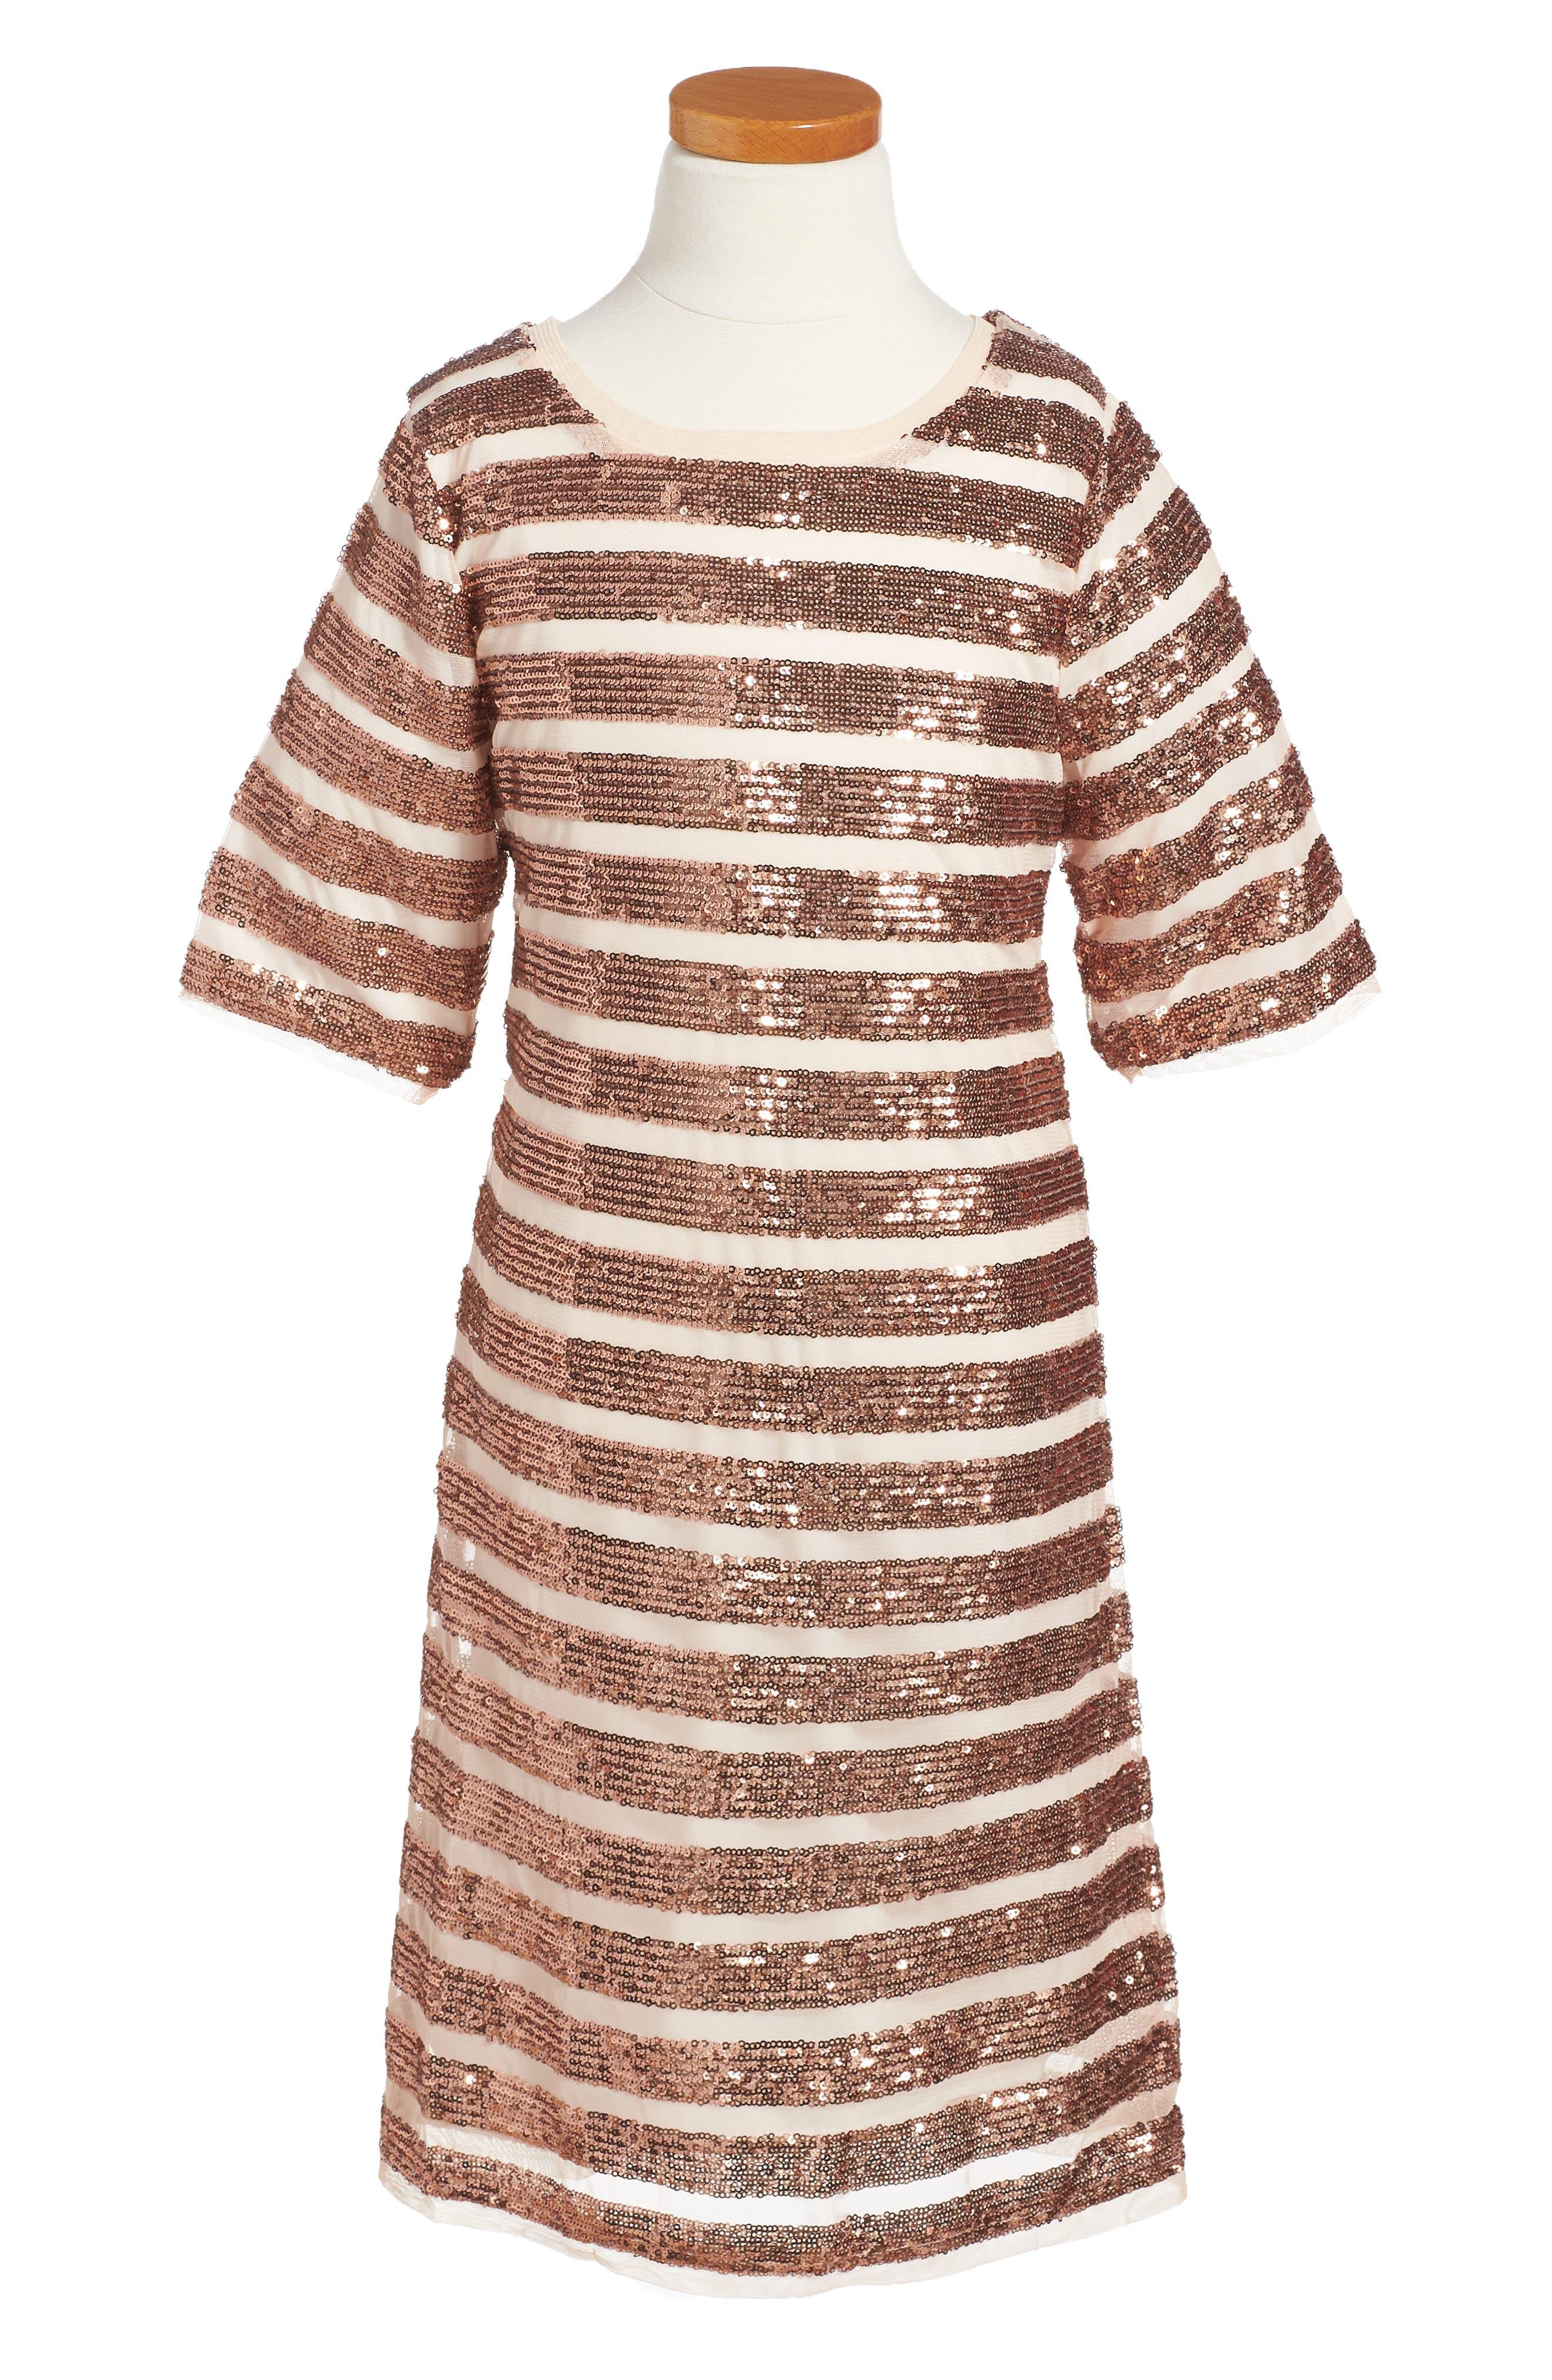 Alternate Image 1 Selected - Dorissa Alexa Sequin Dress (Big Girls)